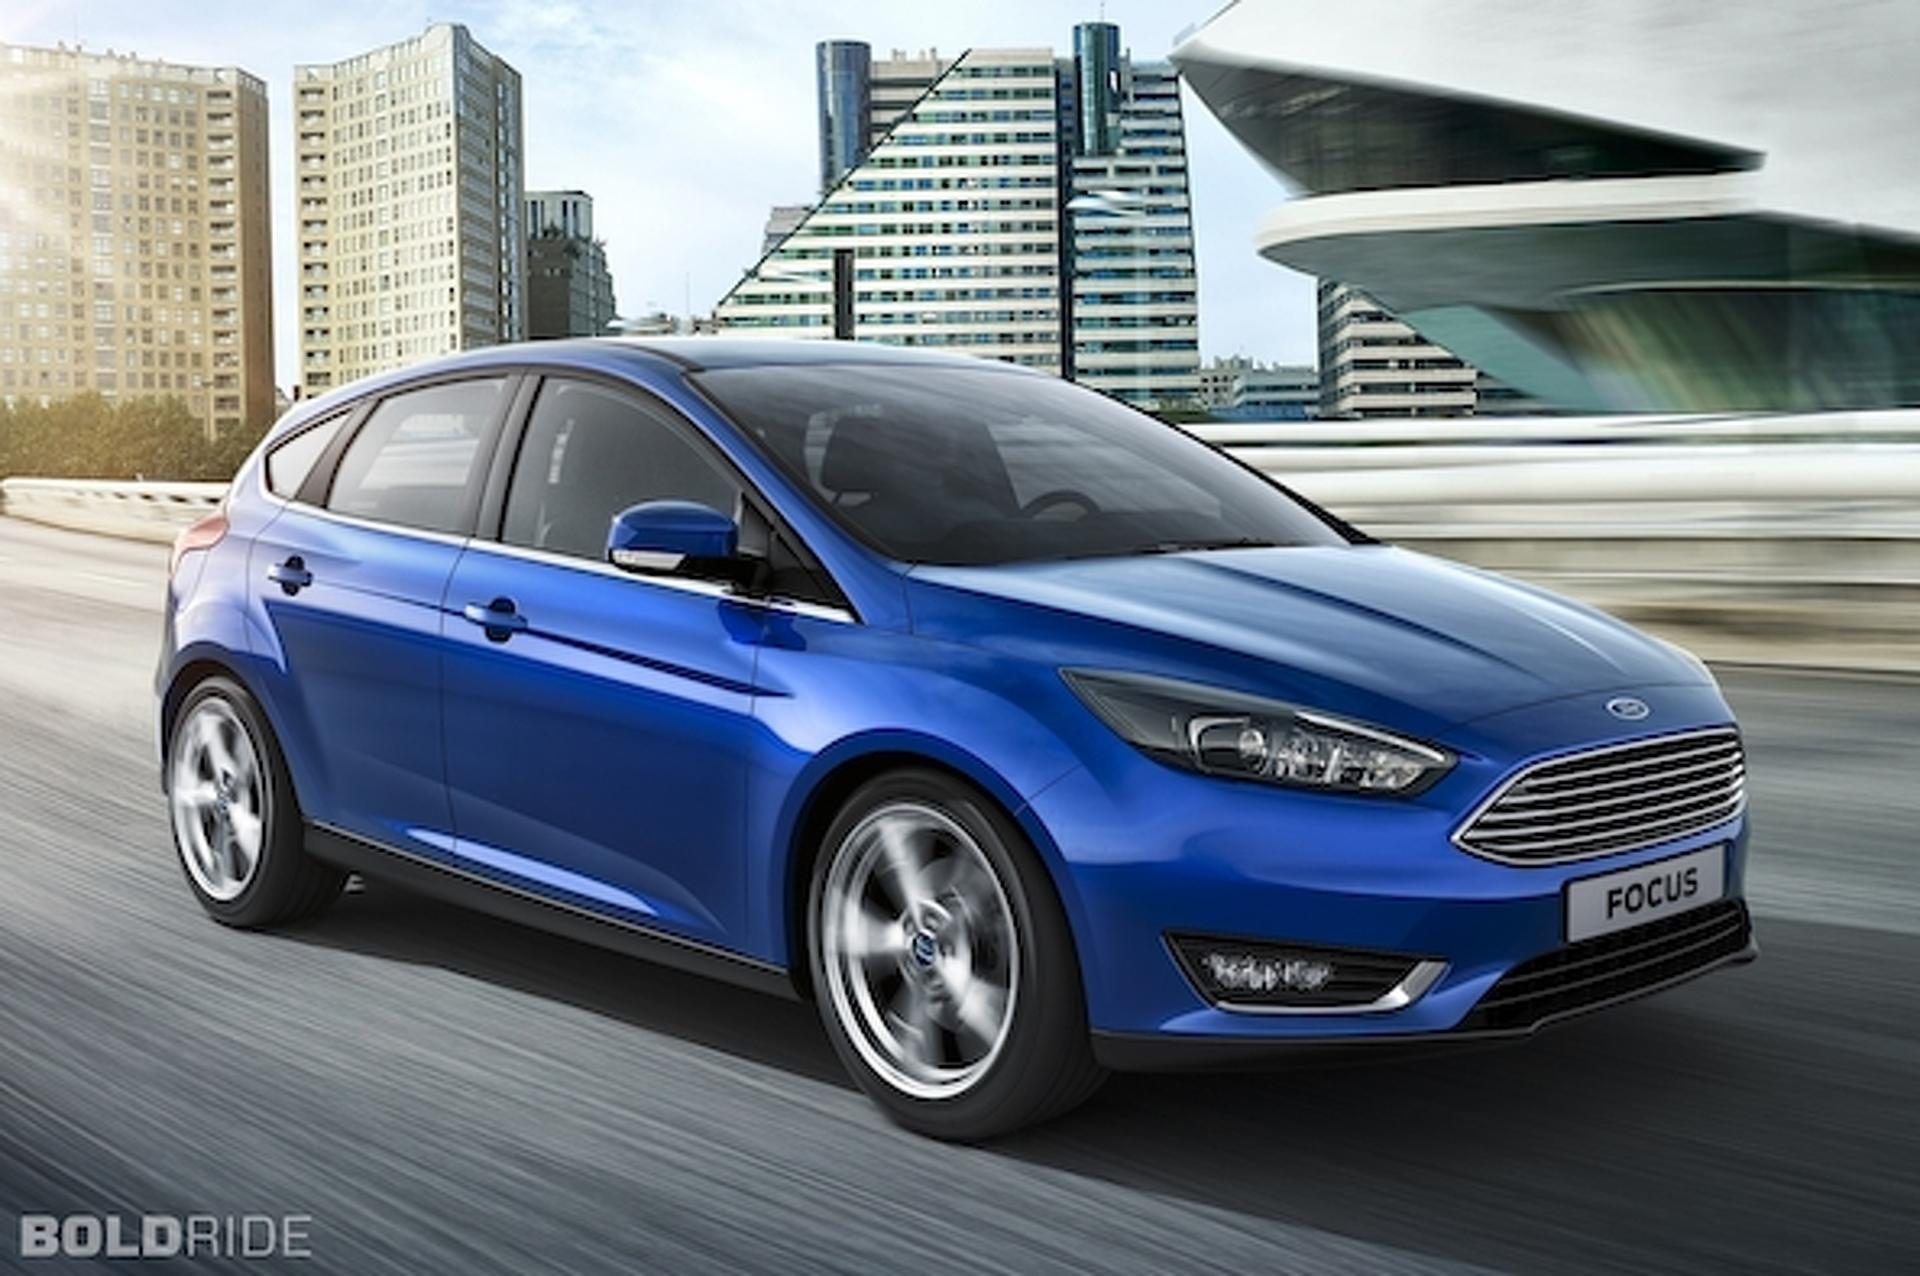 Geneva Motor Show: 15 Rides to Expect